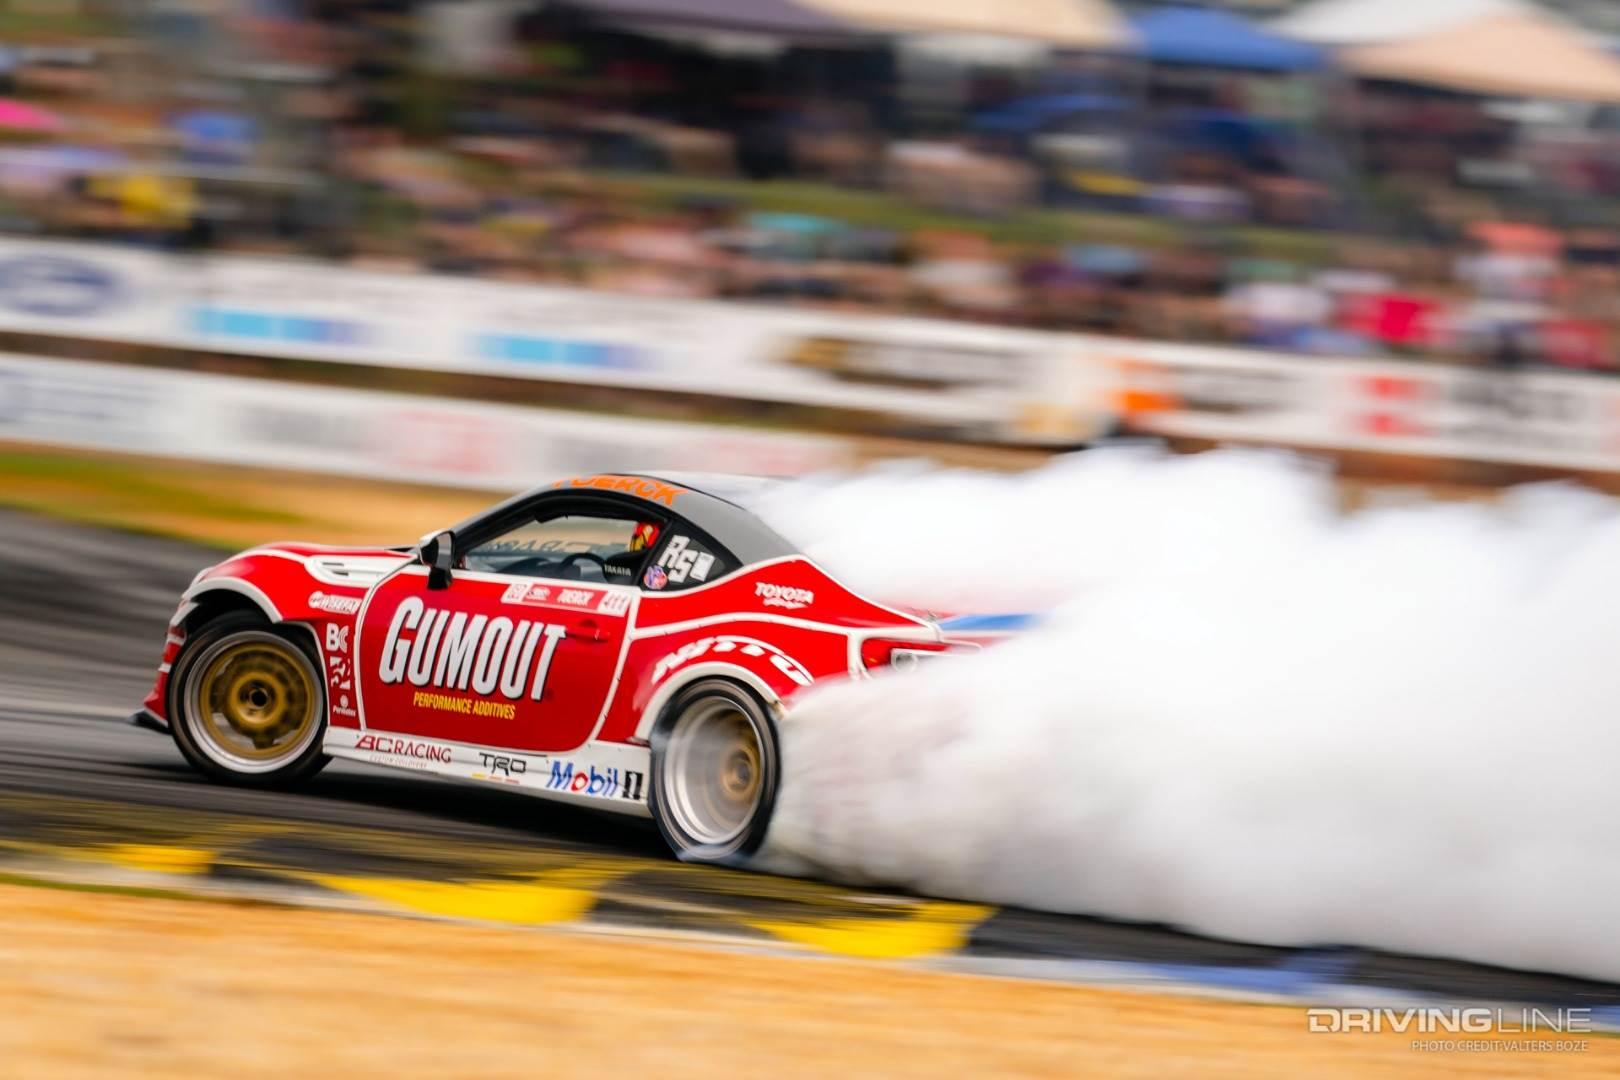 Ryan Tuerk's GT86 drifting